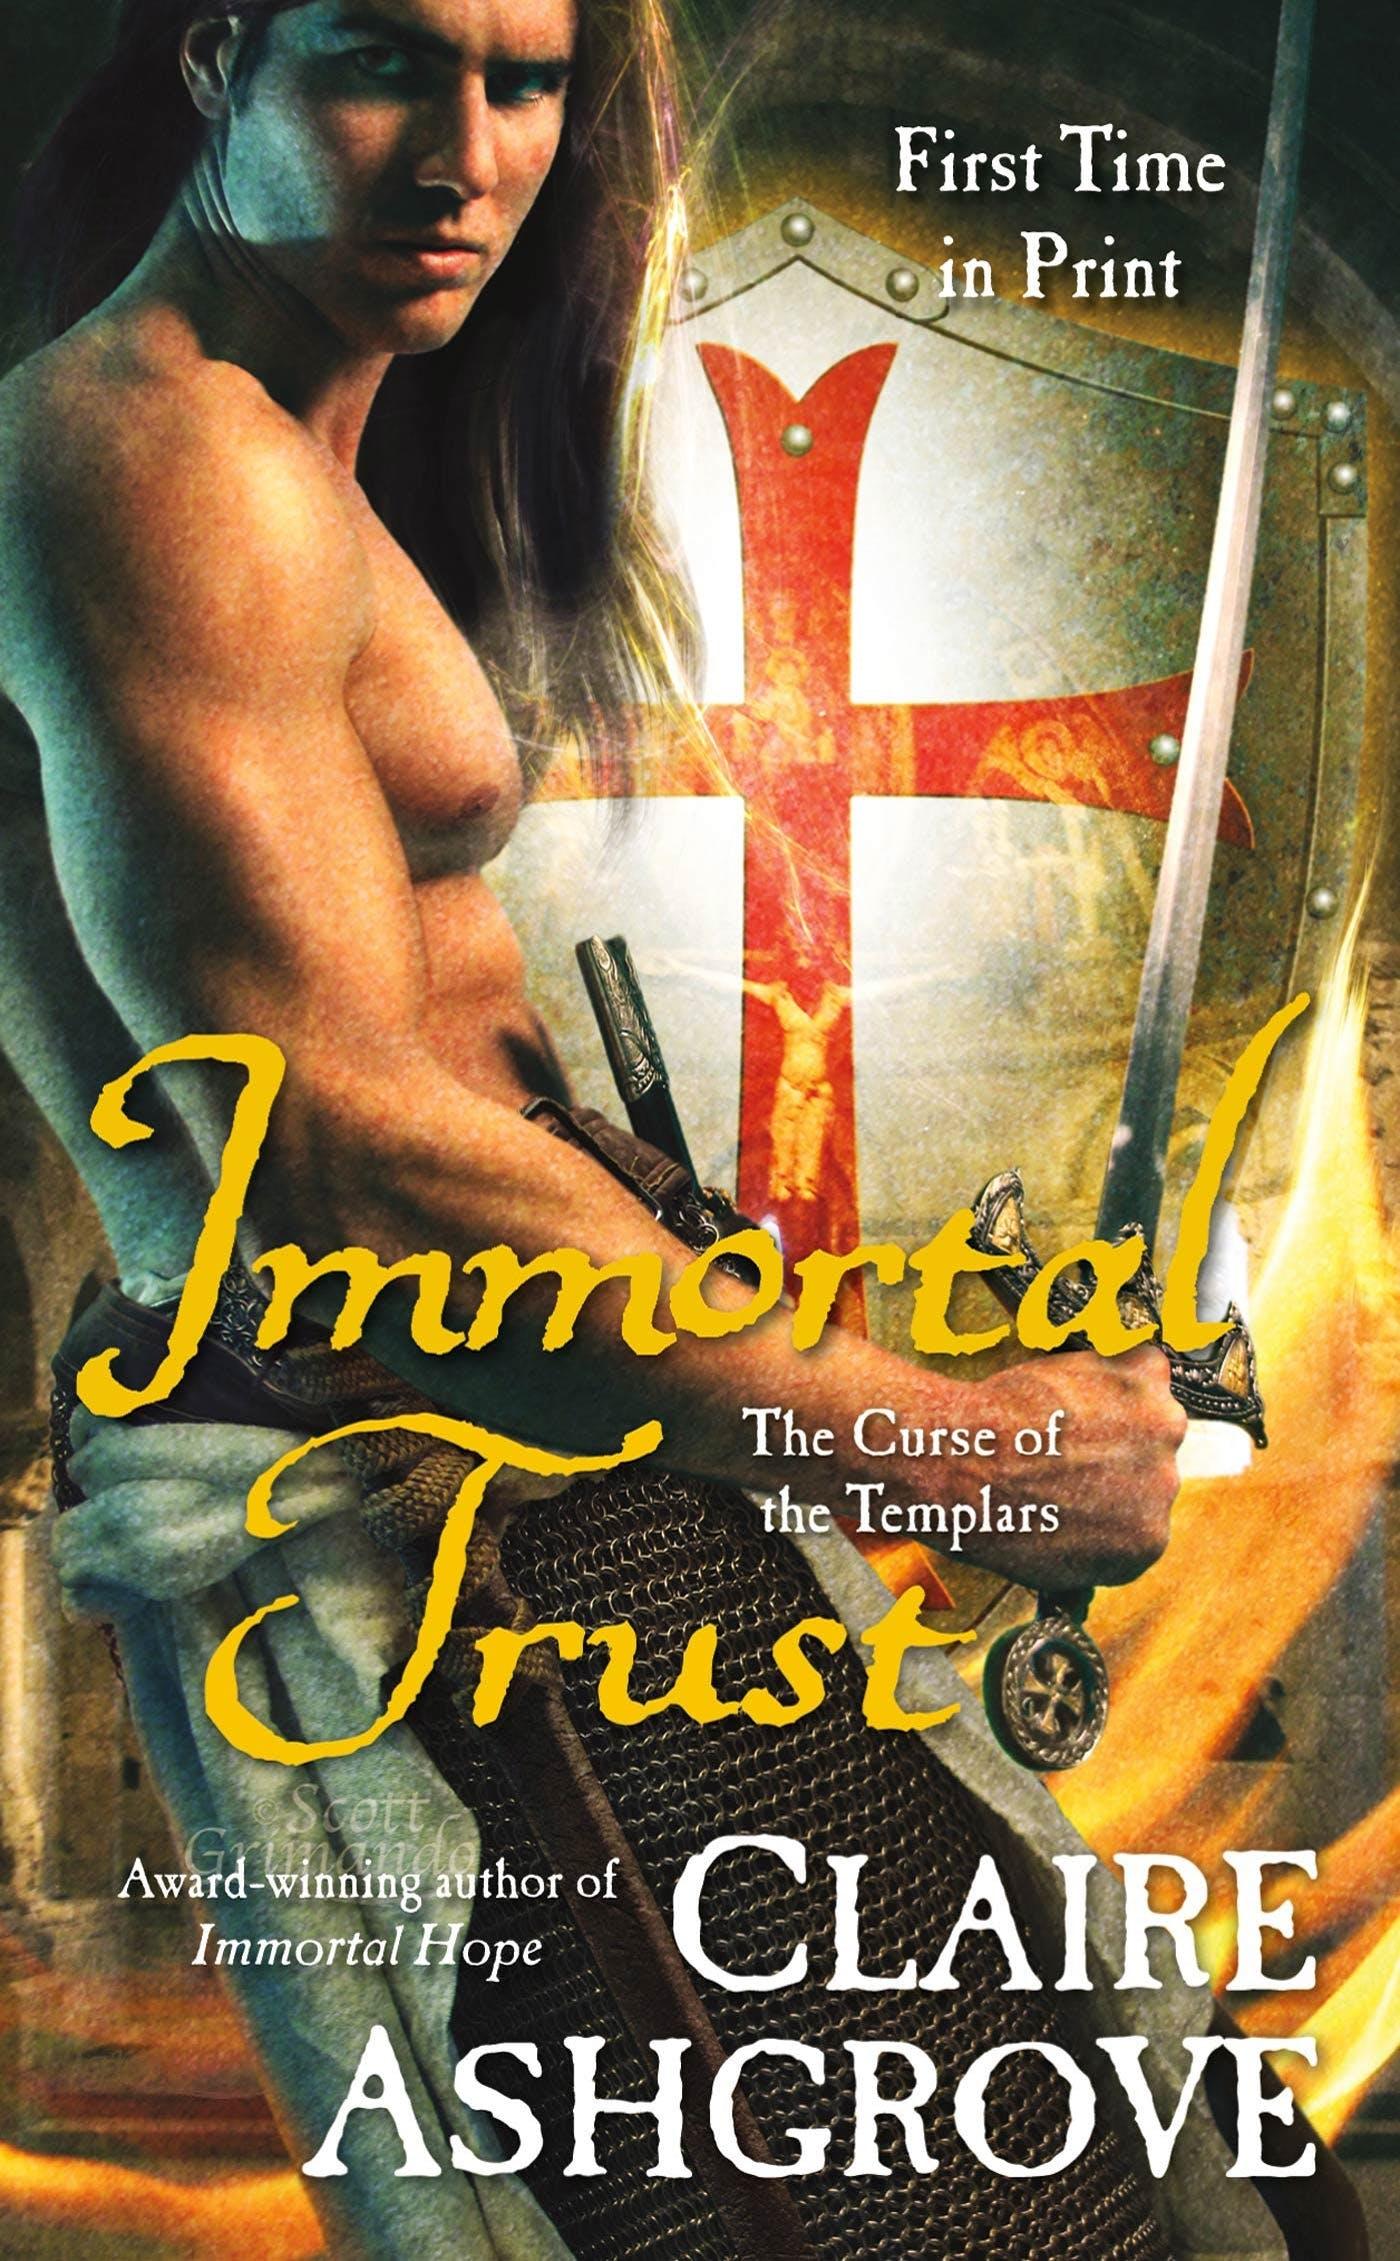 Image of Immortal Trust